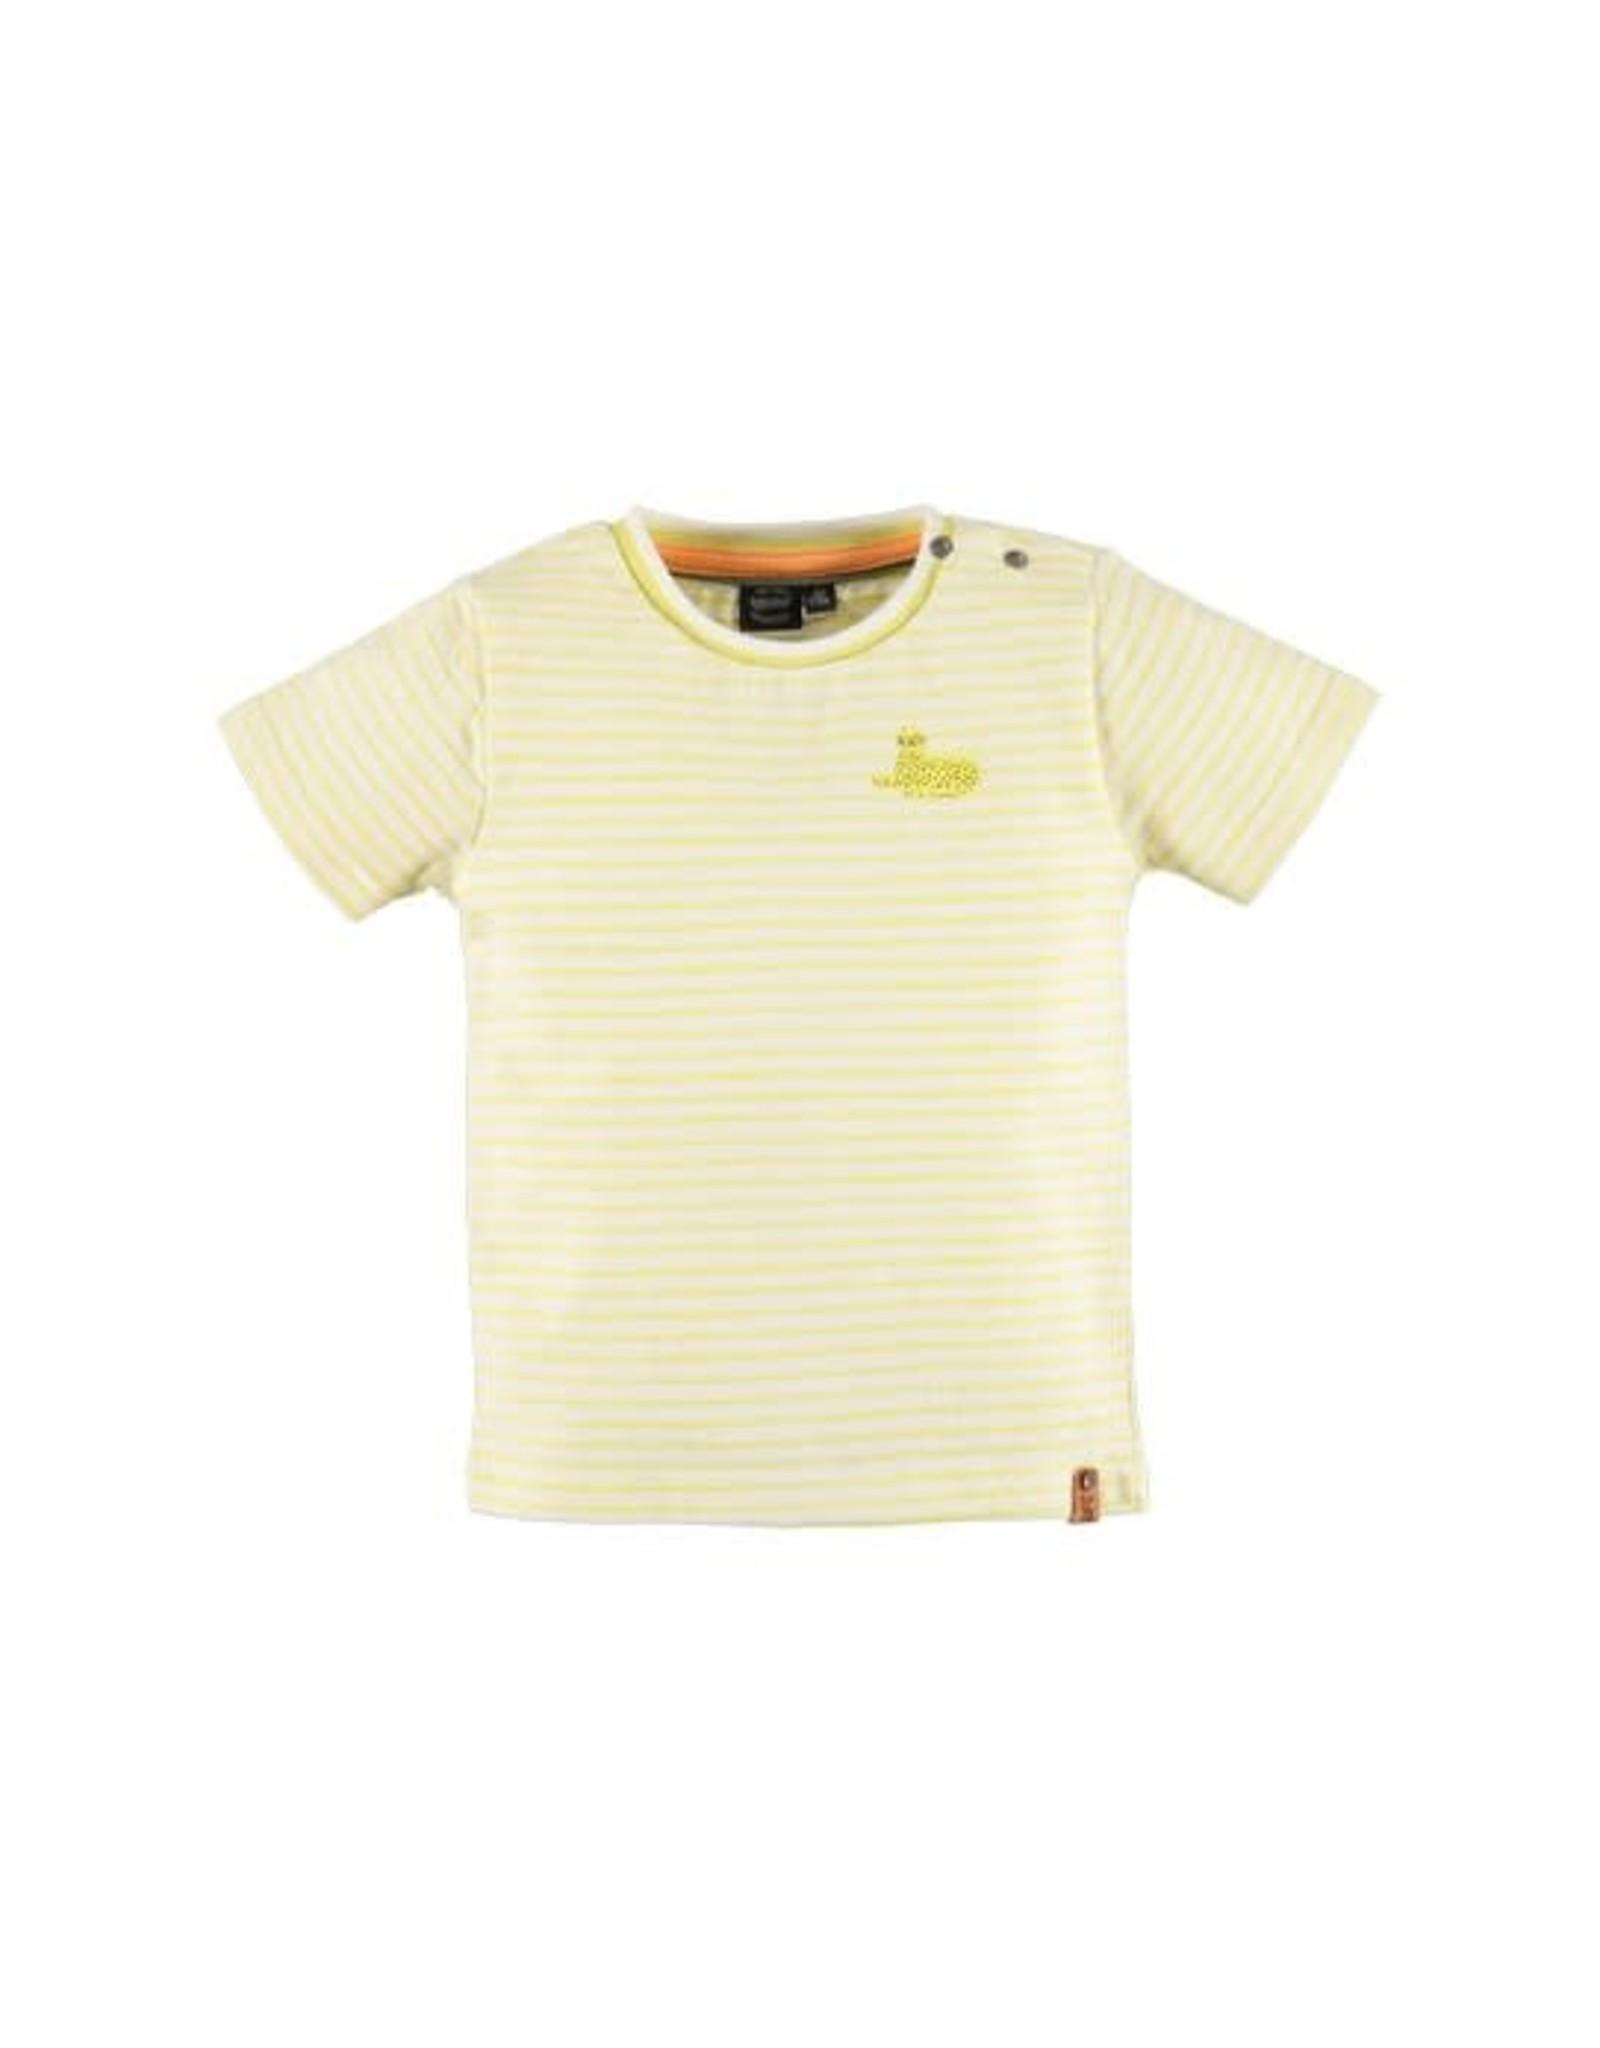 Babyface Jongens-T-shirt  KM met streep citroengeel